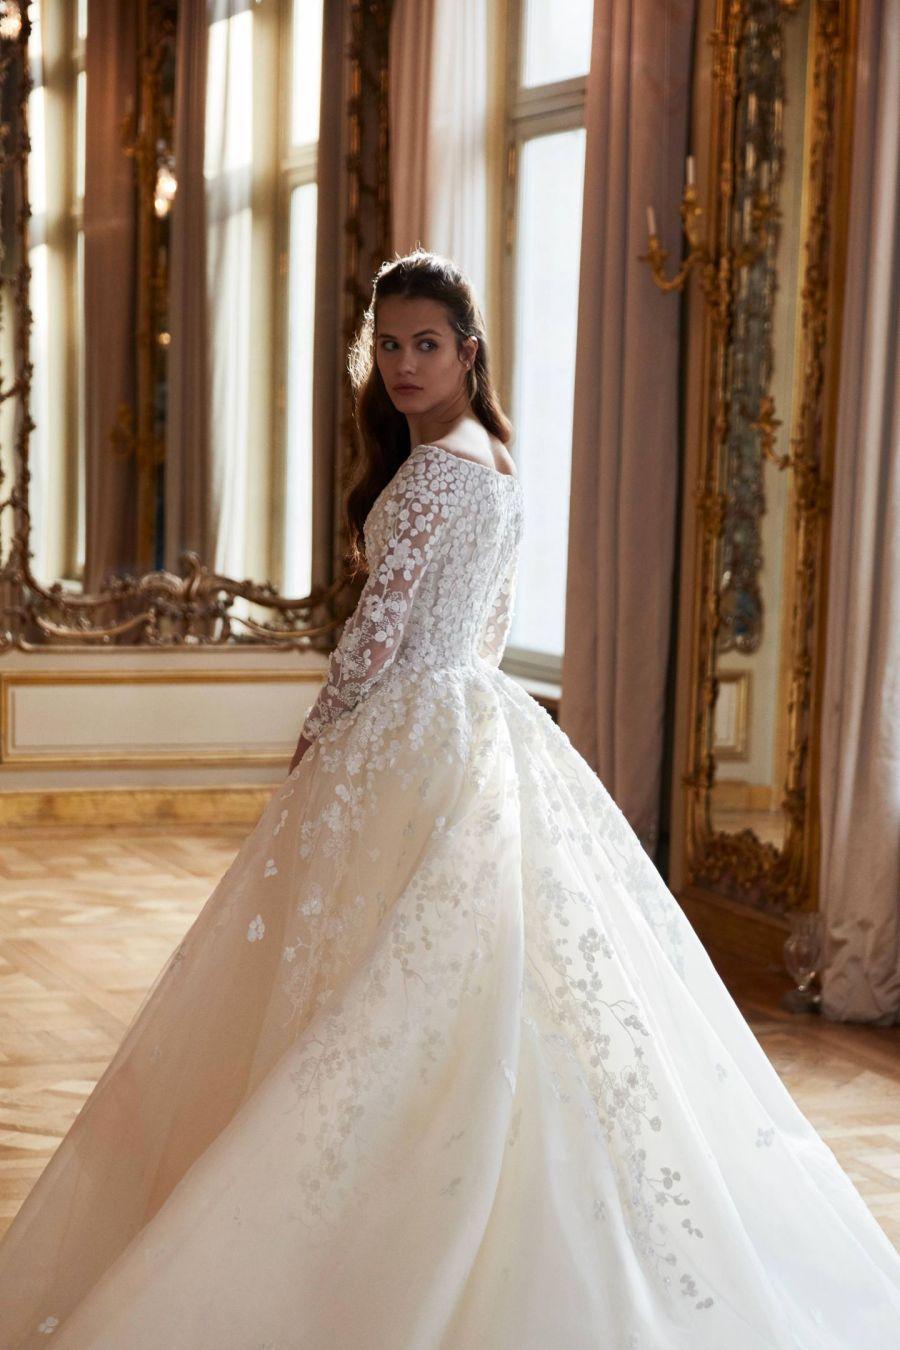 Elie Saab's spring 2019 bridal collection